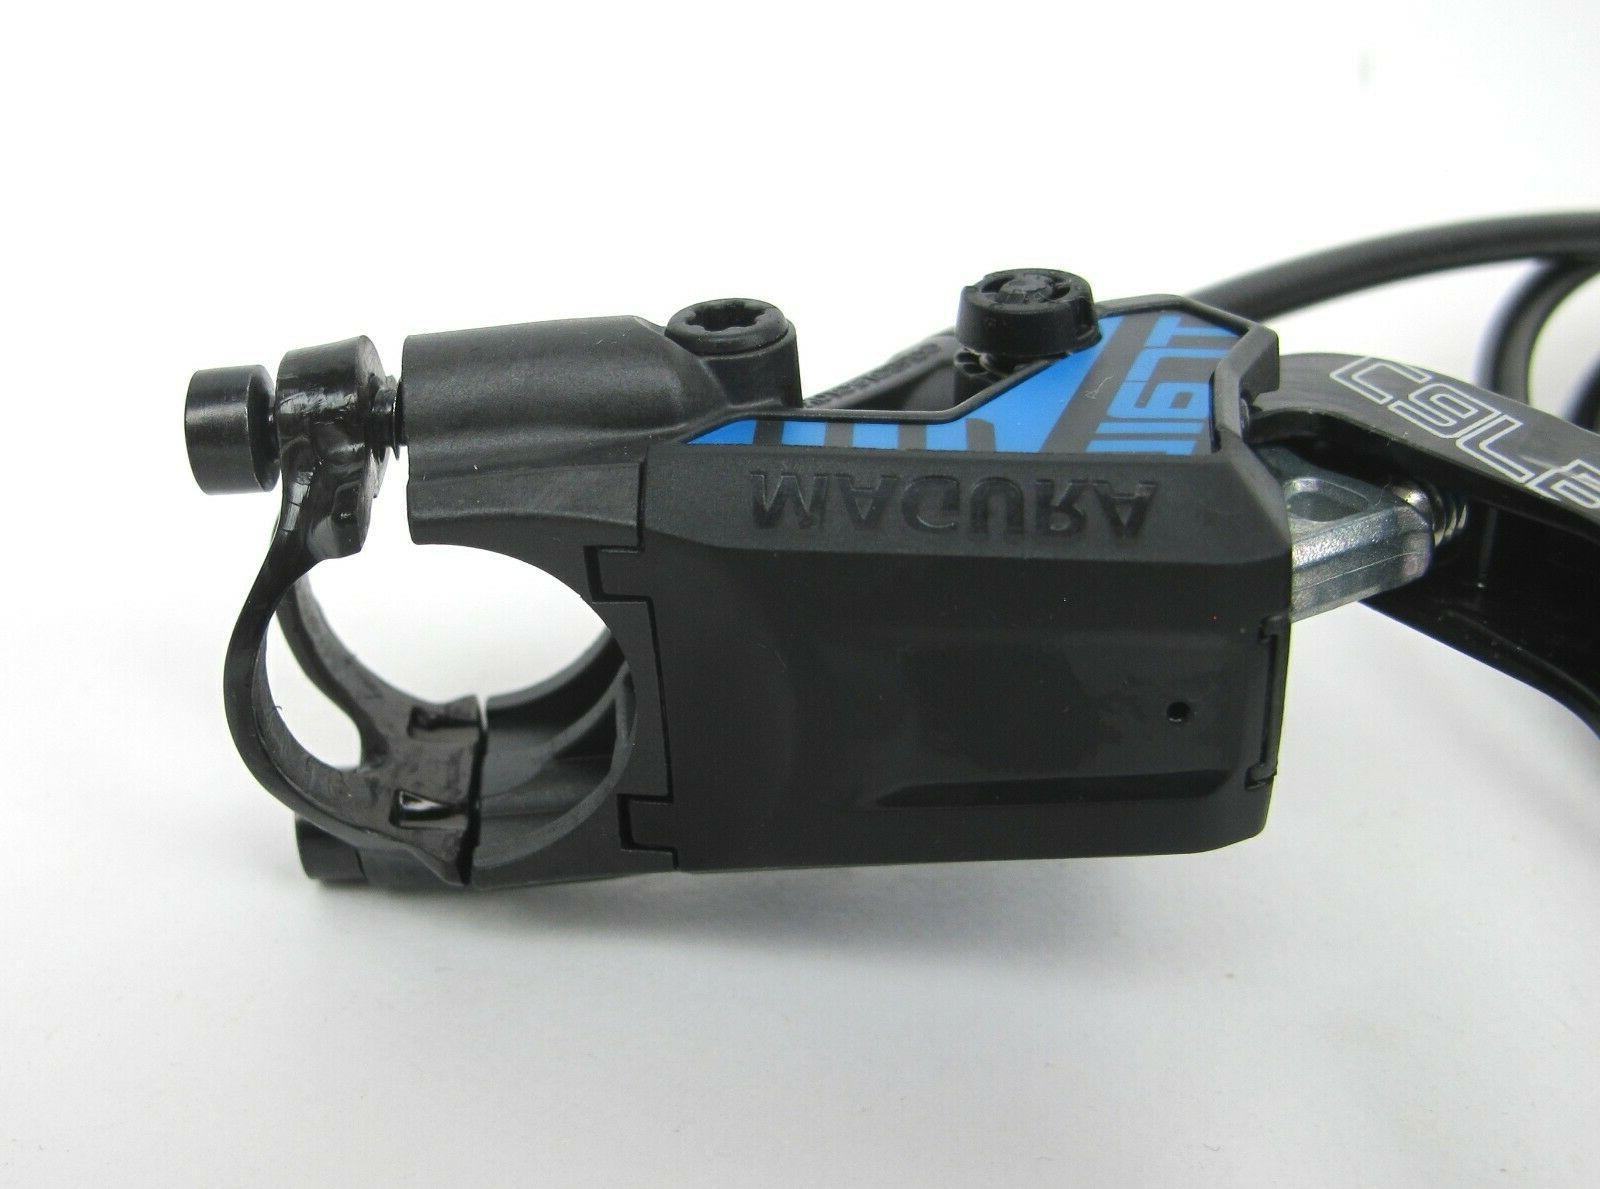 Magura Hydraulic MTB Brakeset 180mm - and Rear